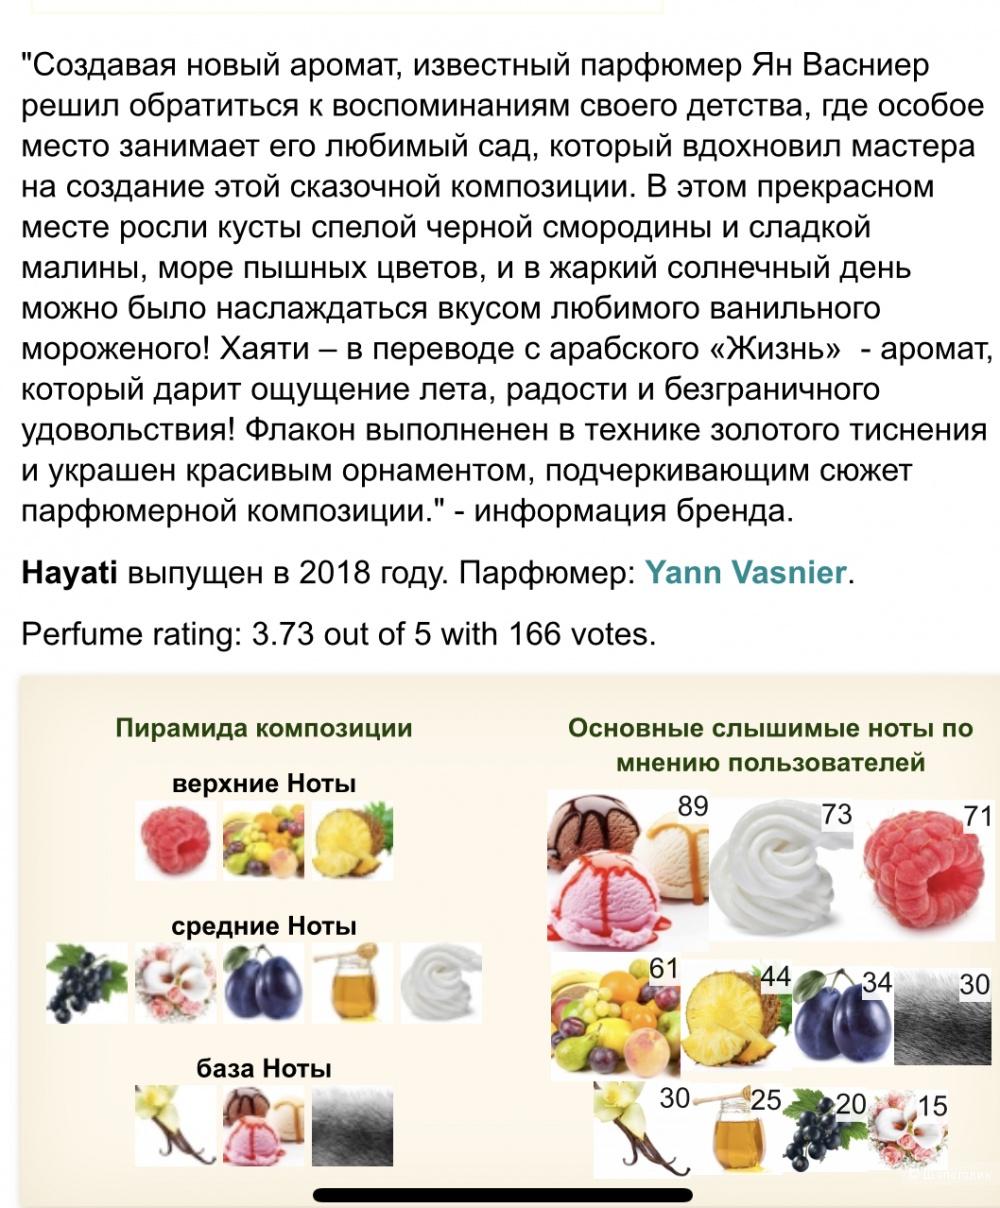 Парфюм Attar collection Hayati, 100 мл